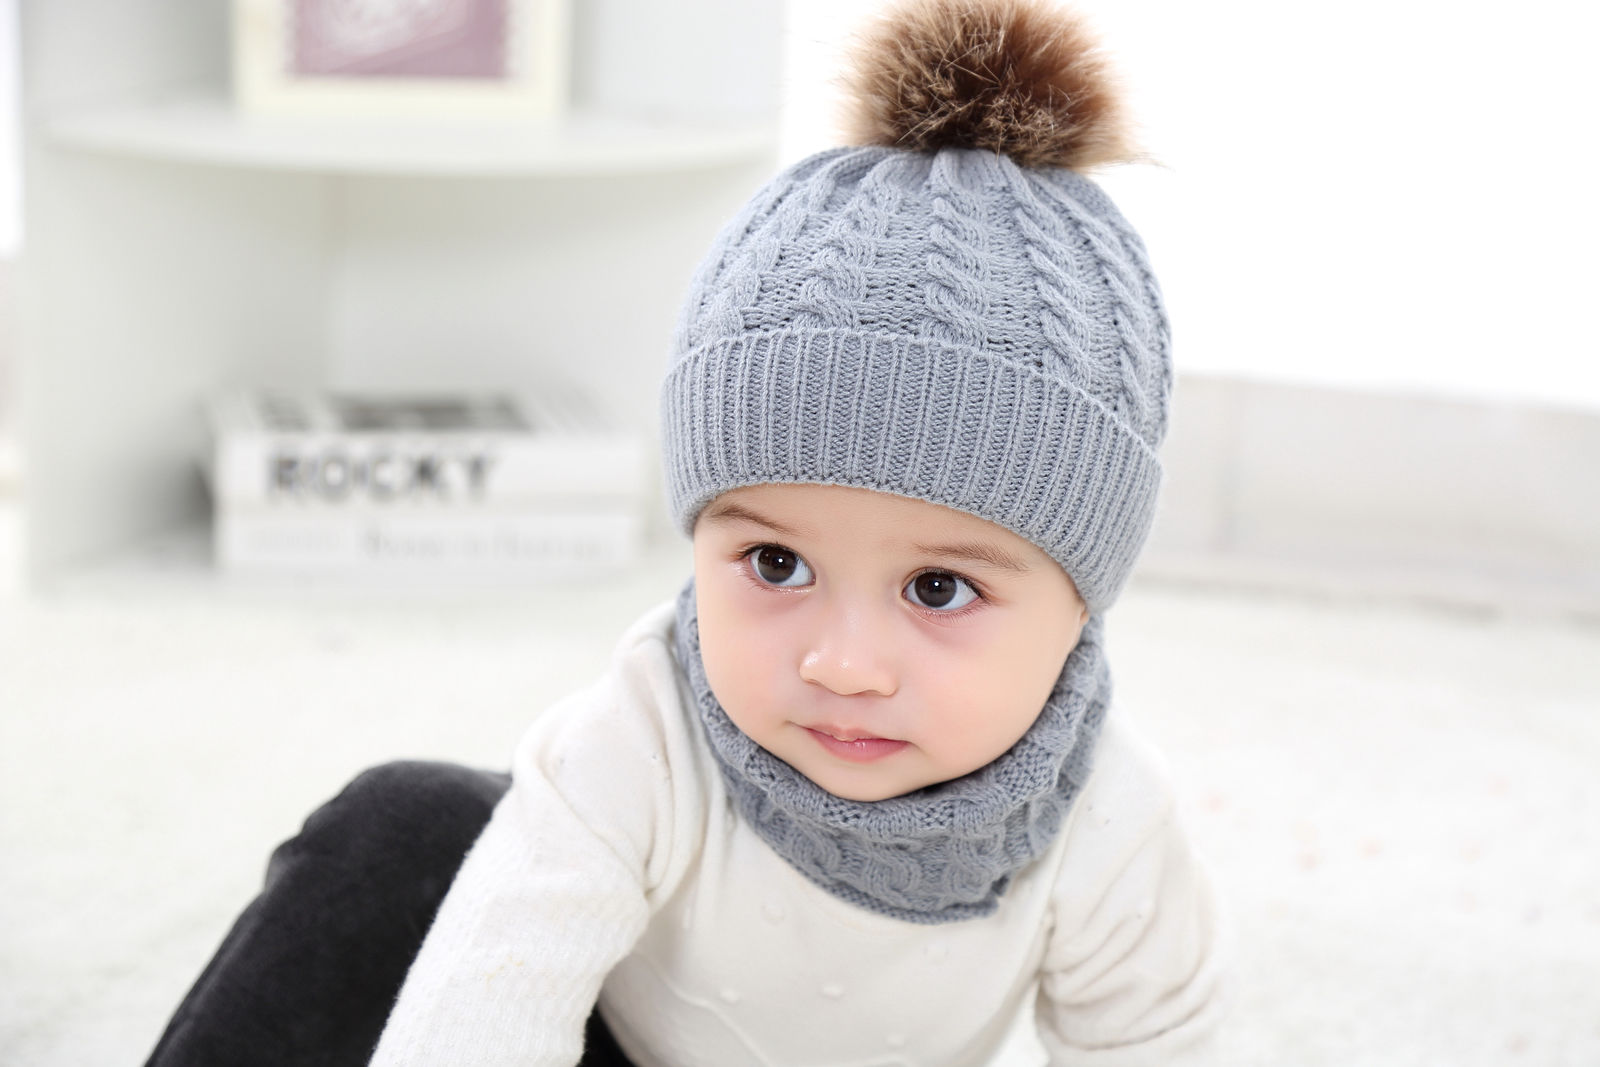 Boys' Baby Clothing Hats & Caps Brilliant Toddler Baby Winter New Hat Children Boy Girl Cartoon Dog 3d Stereo Long Ear Warm Hat